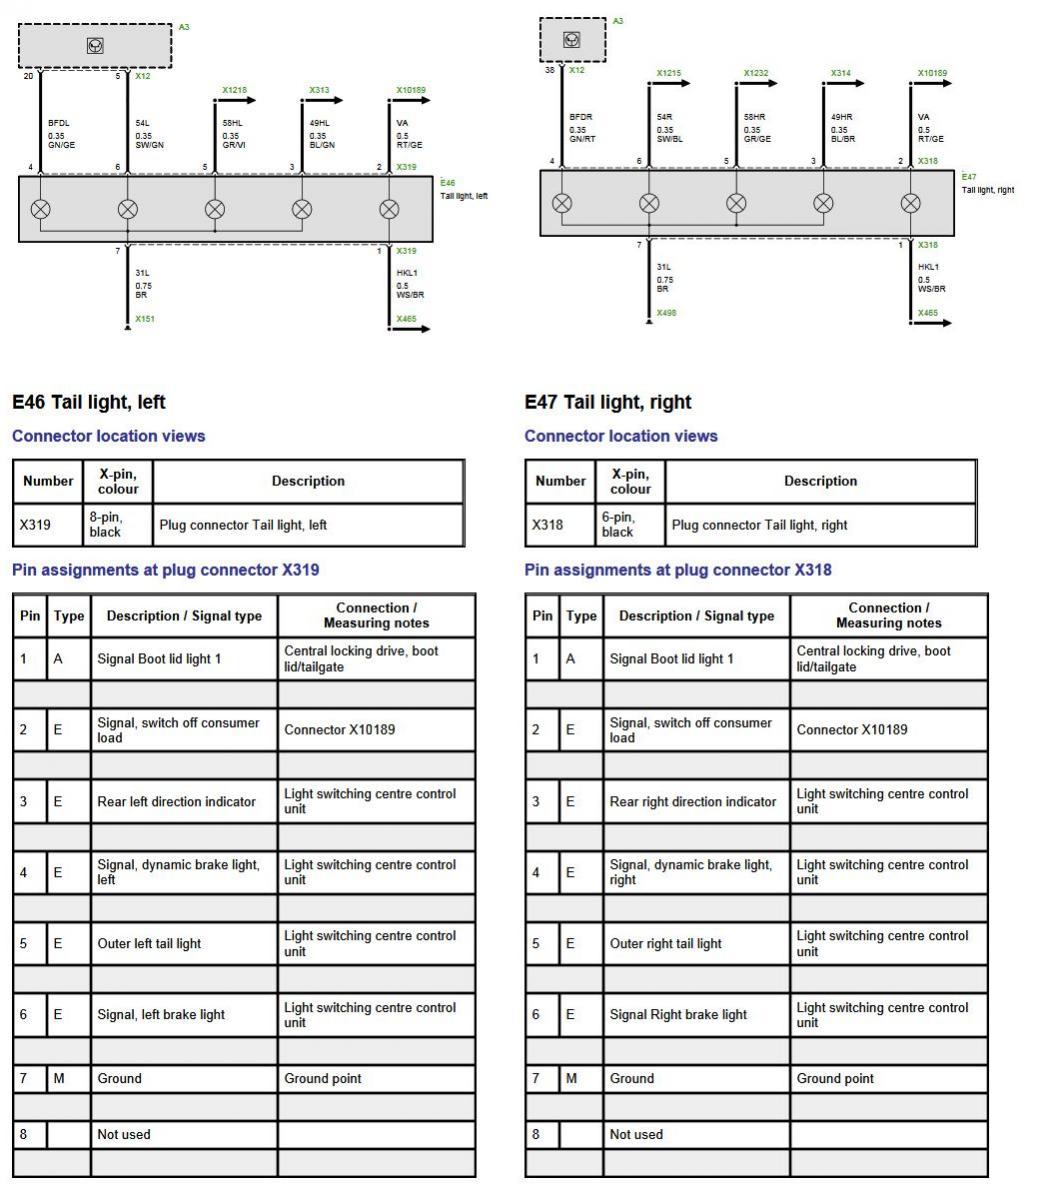 bmw e46 wiring diagram stereo bmw image wiring diagram bmw e46 radio harness diagram bmw auto wiring diagram schematic on bmw e46 wiring diagram stereo